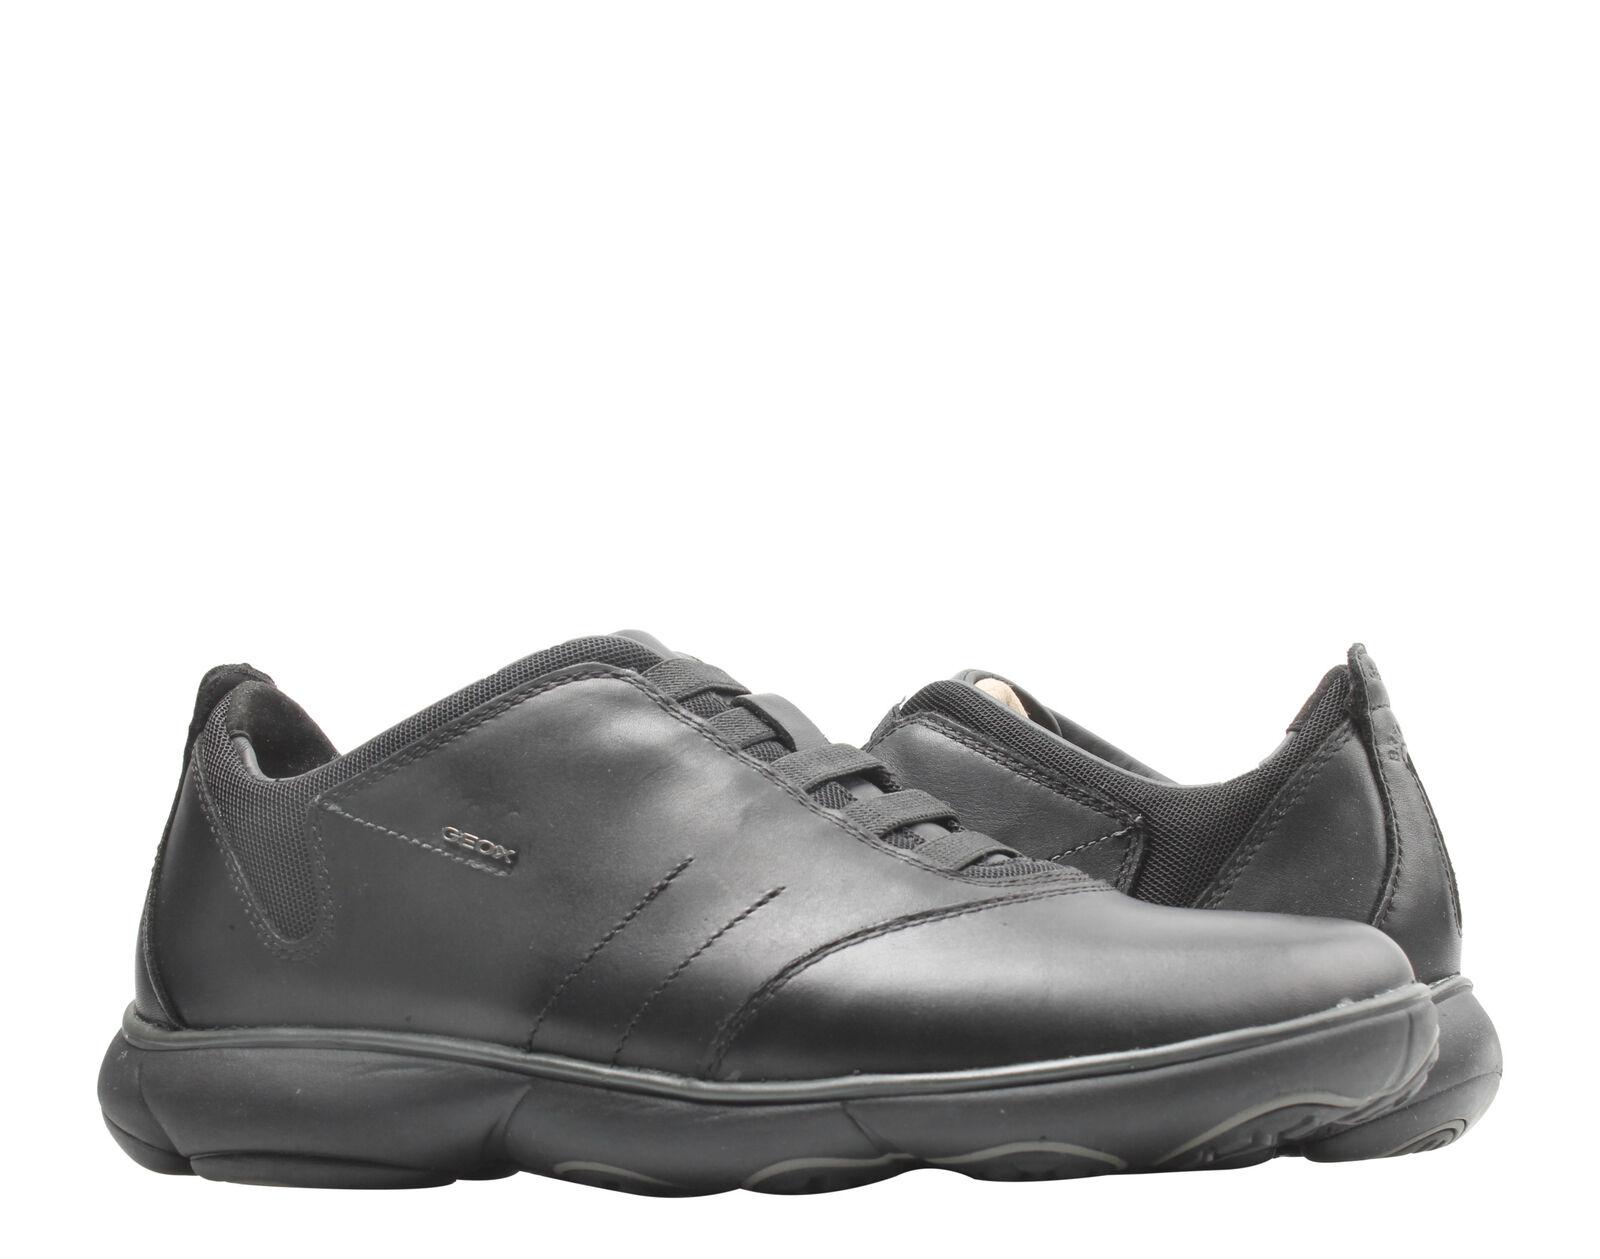 Resentimiento vestirse Señor  Geox Men's Nebula U52d7b 00046 C9999 Black Leather Black 7 for sale online  | eBay